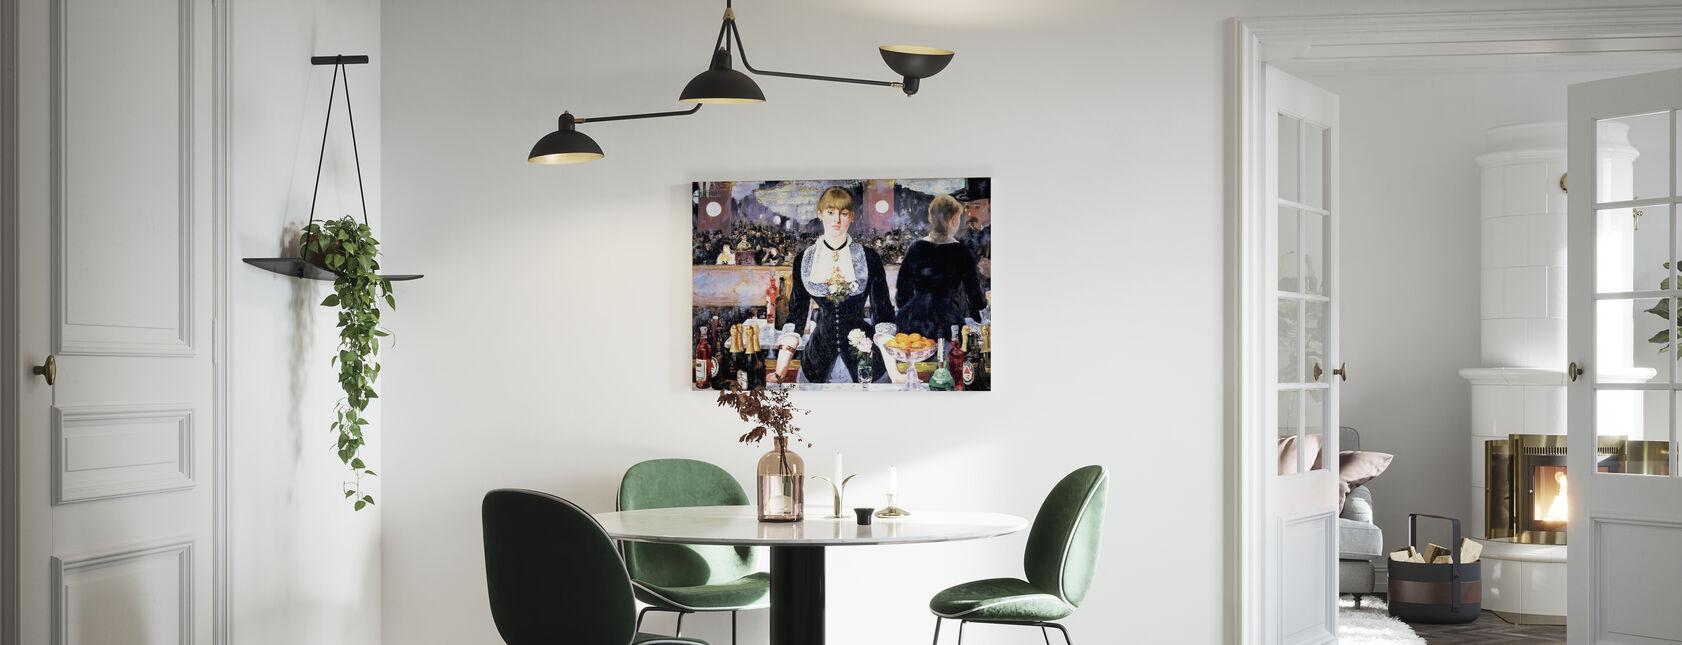 Bar at Folies-Bergere, Edouard Manet - Canvas print - Kitchen